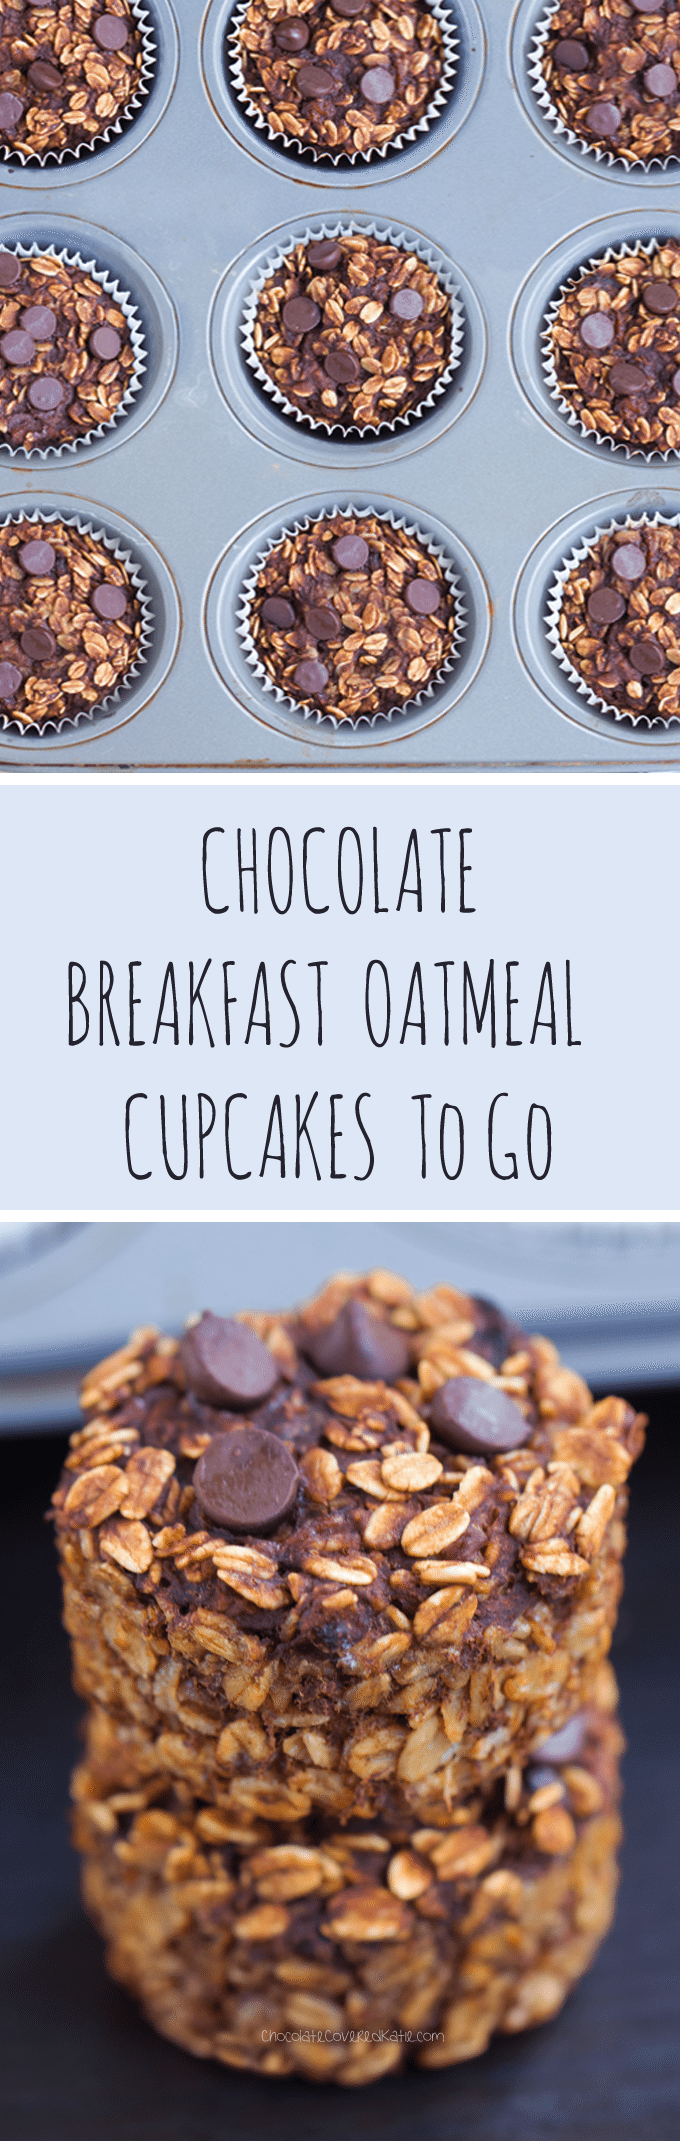 Easy chocolate breakfast recipes